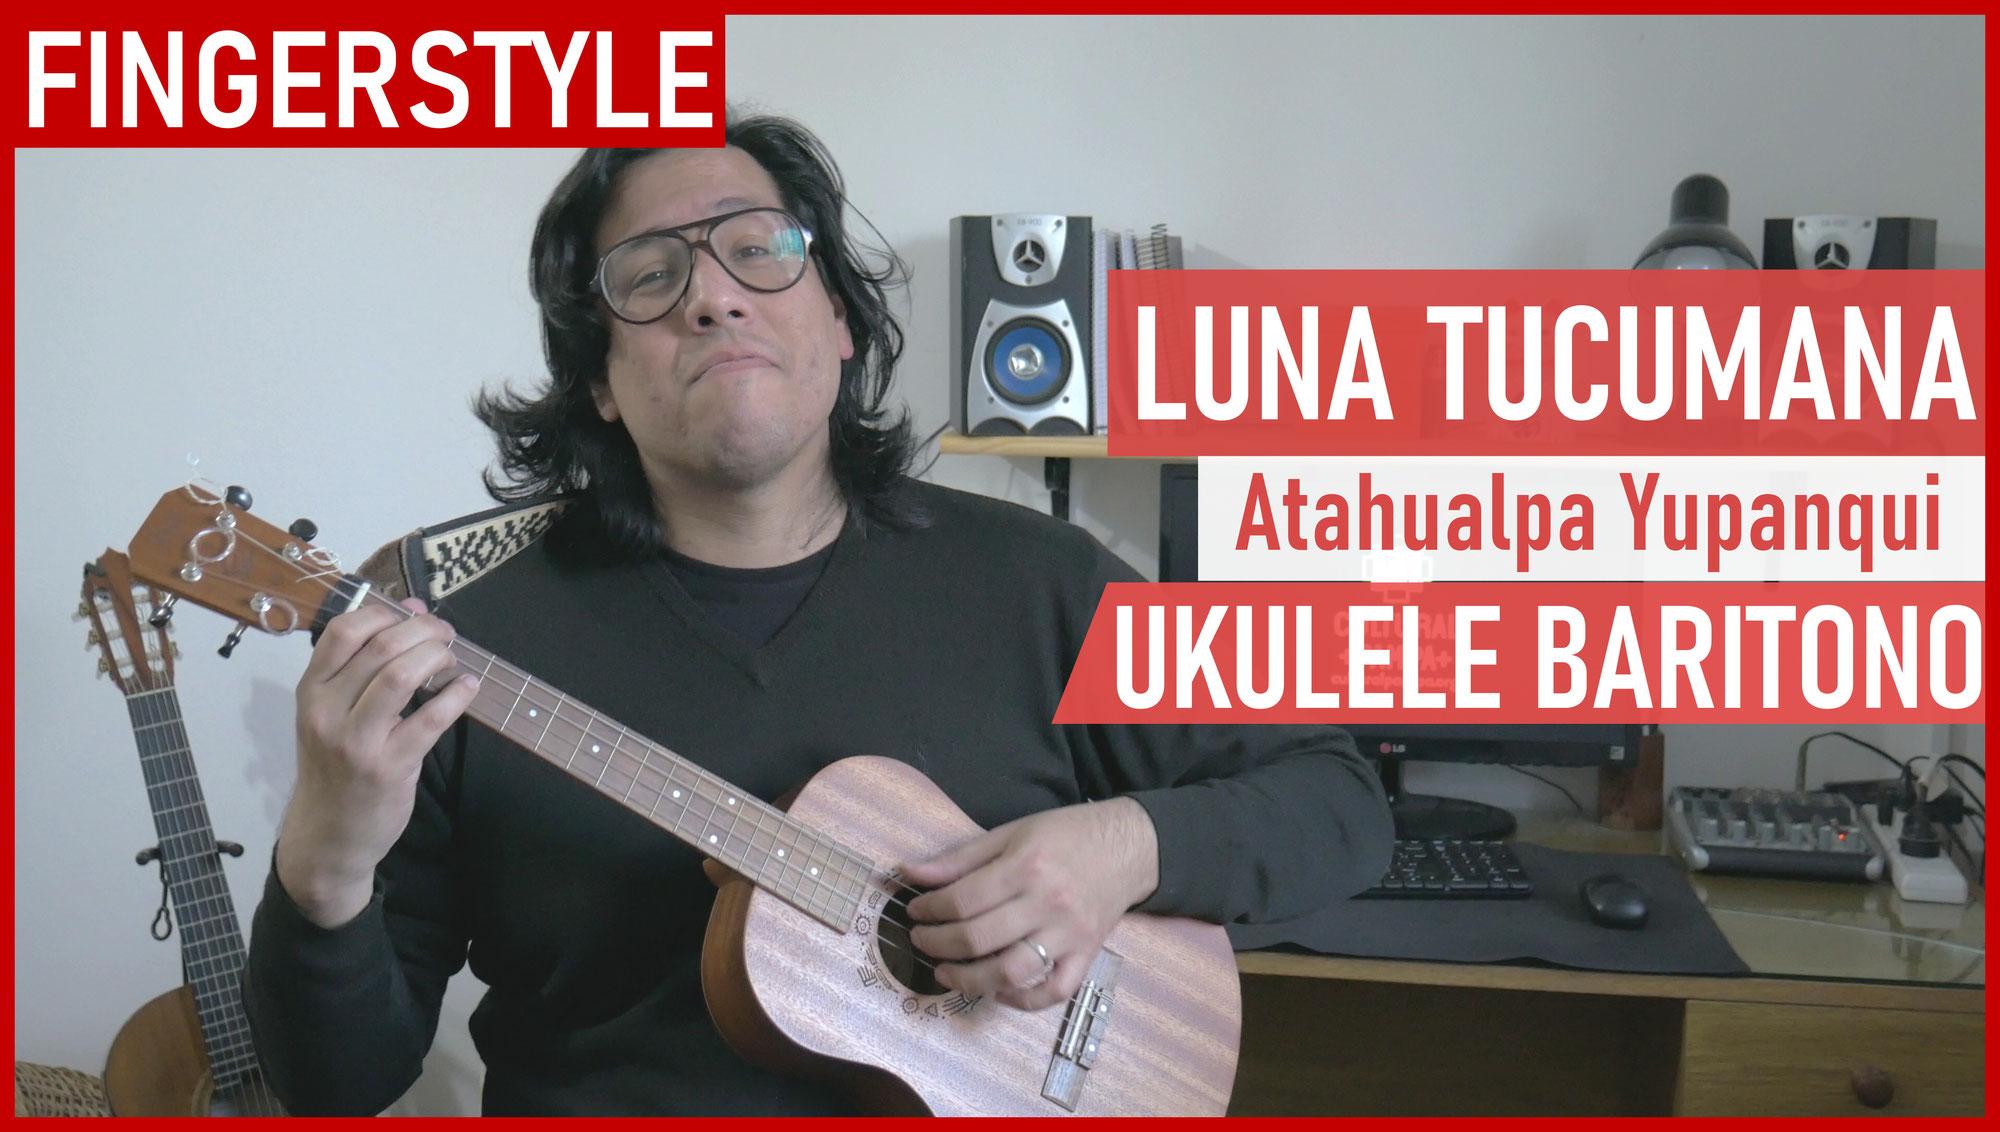 Luna Tucumana | Uke Baritono Fingerstyle